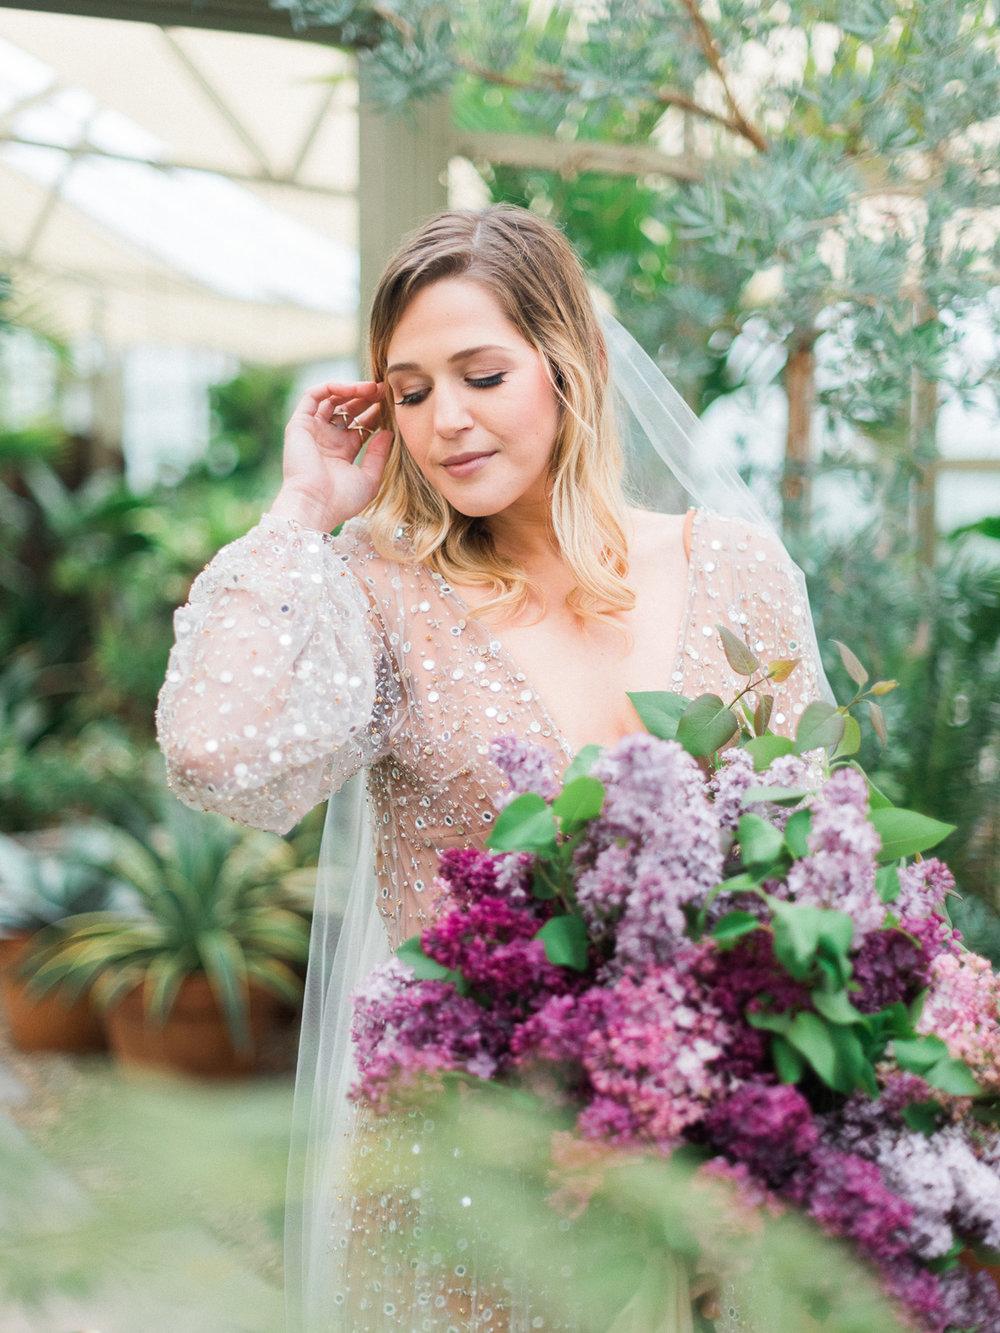 christinadavisphotography+romantic+greenhouse+jardindebuis+styledshoot42.jpg